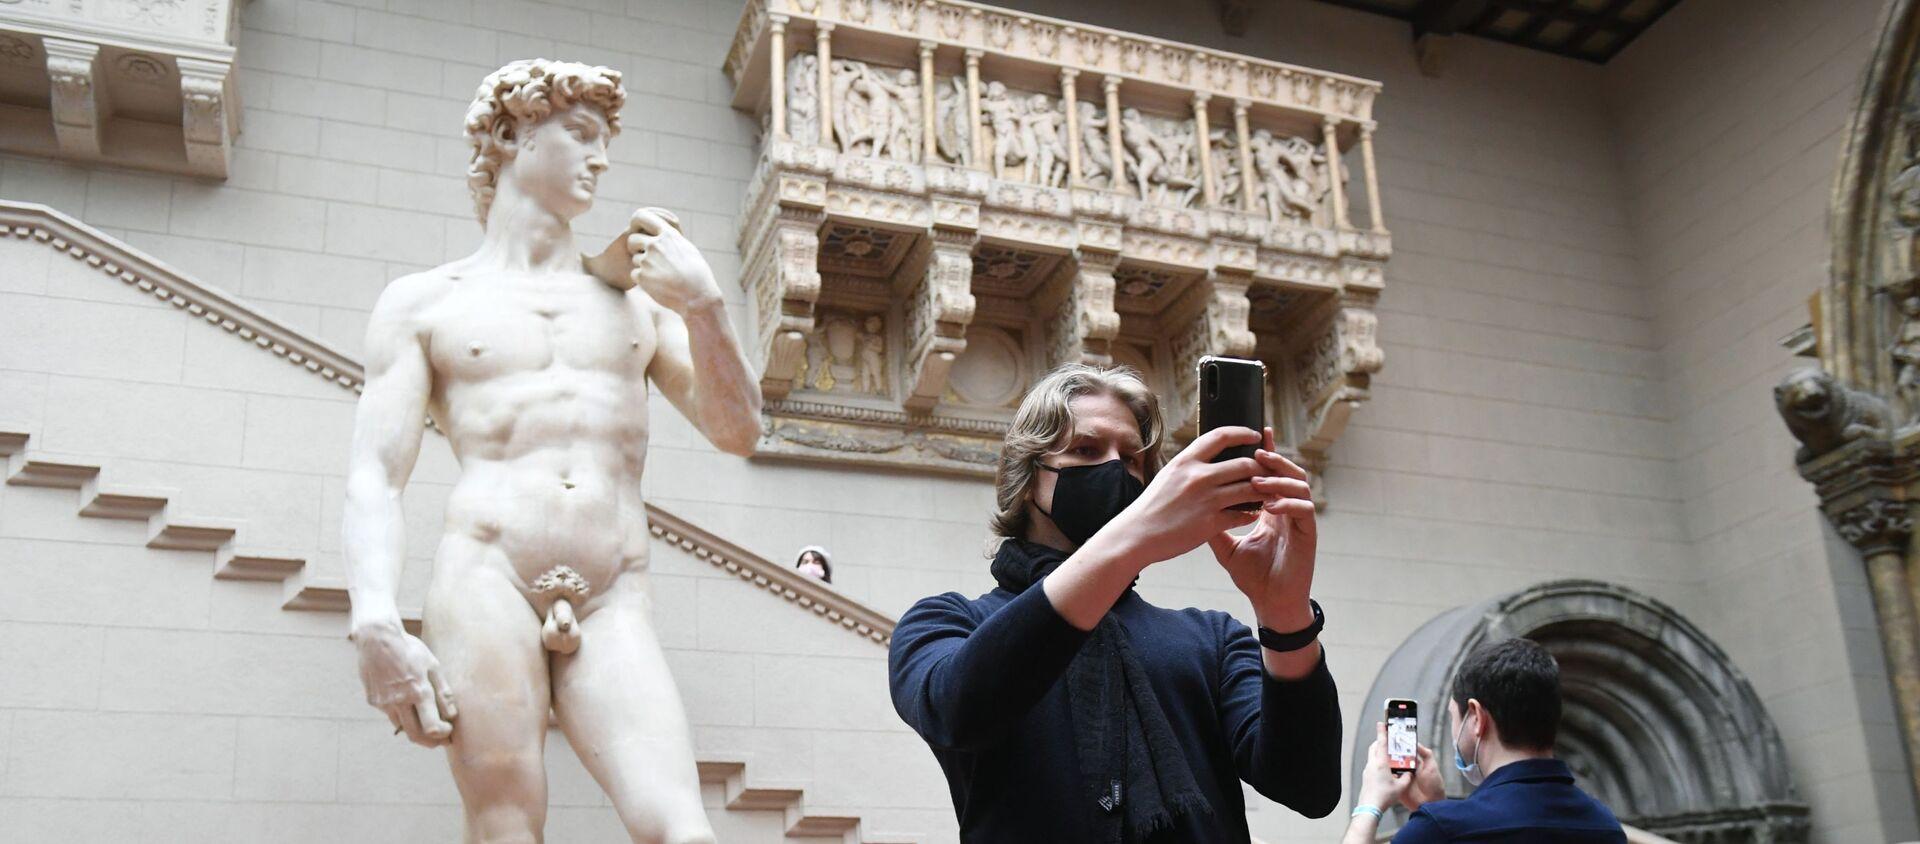 David di Michelangelo, il museo di Pushkin, Mosca - Sputnik Italia, 1920, 23.01.2021